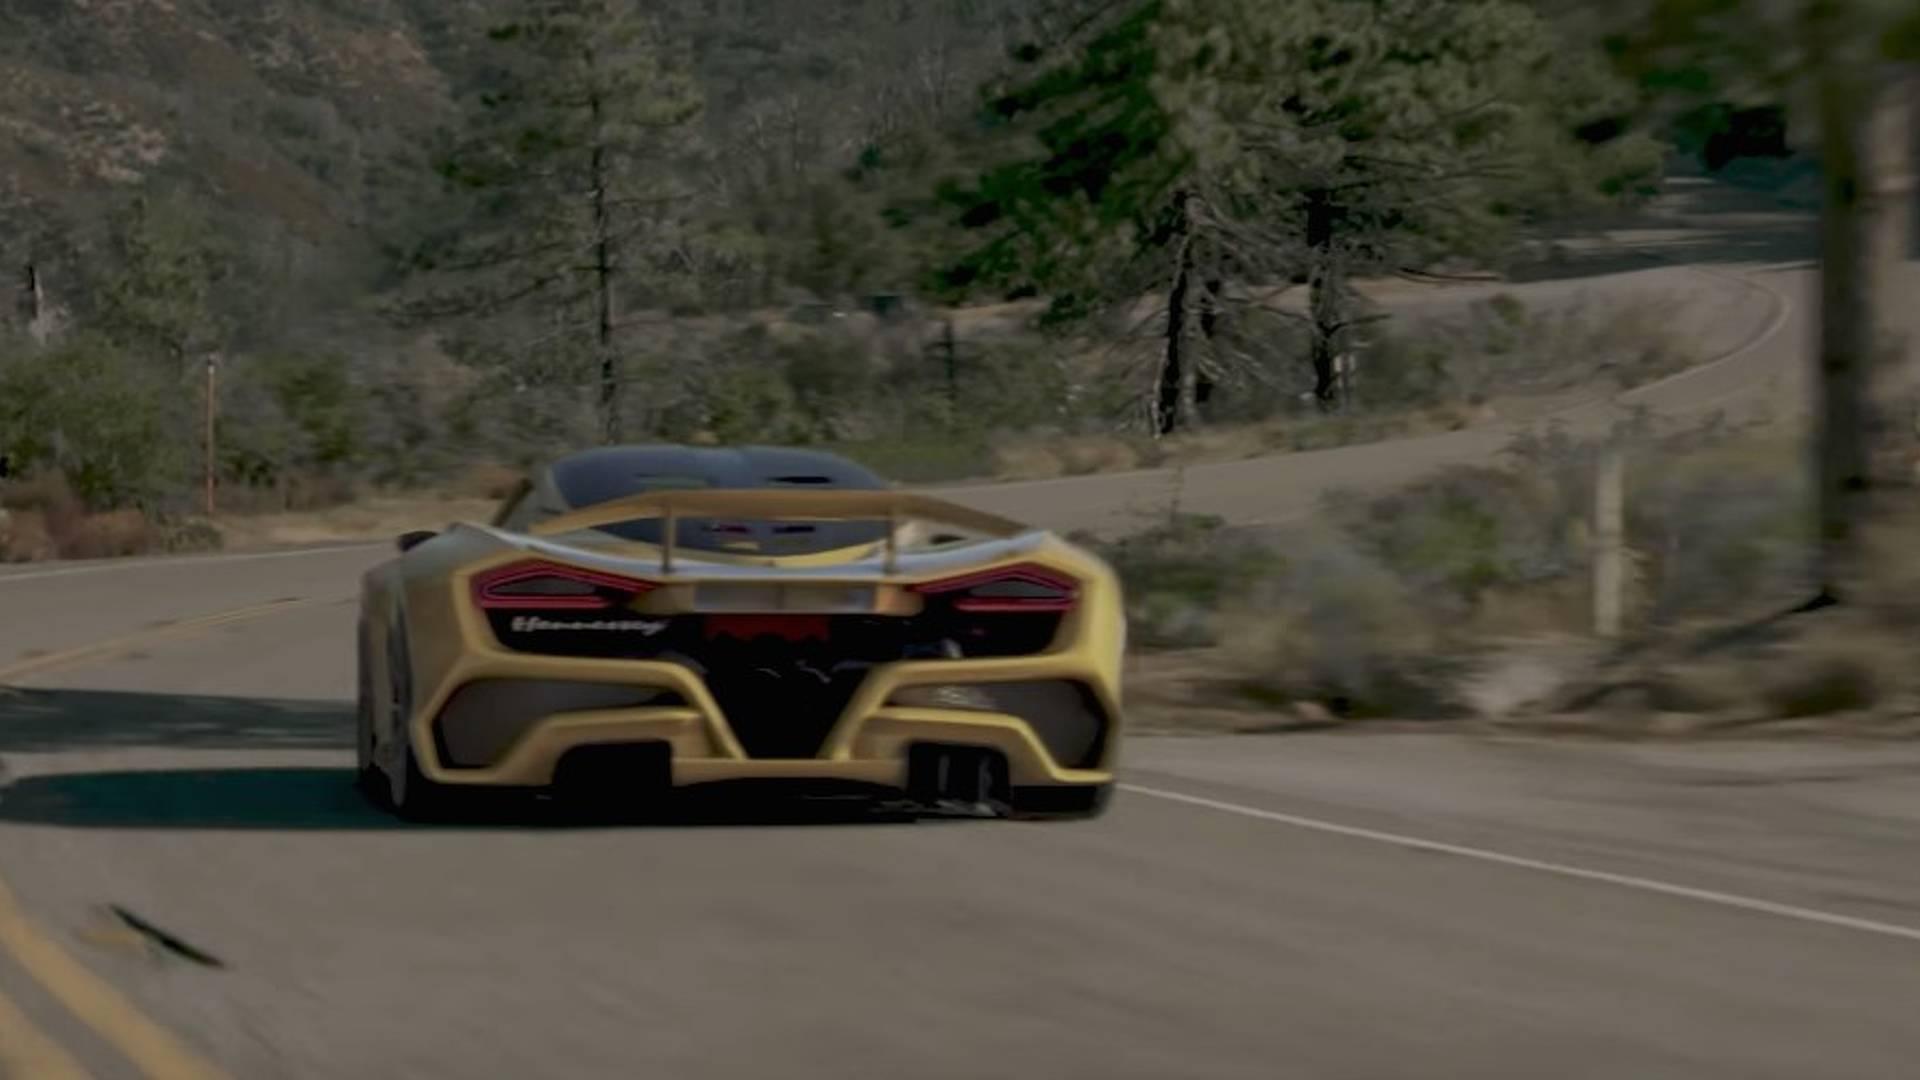 Hennessey Venom F5 Interior >> Hennessey Venom F5 Top Speed Likely To Surpass 300 MPH - autoevolution